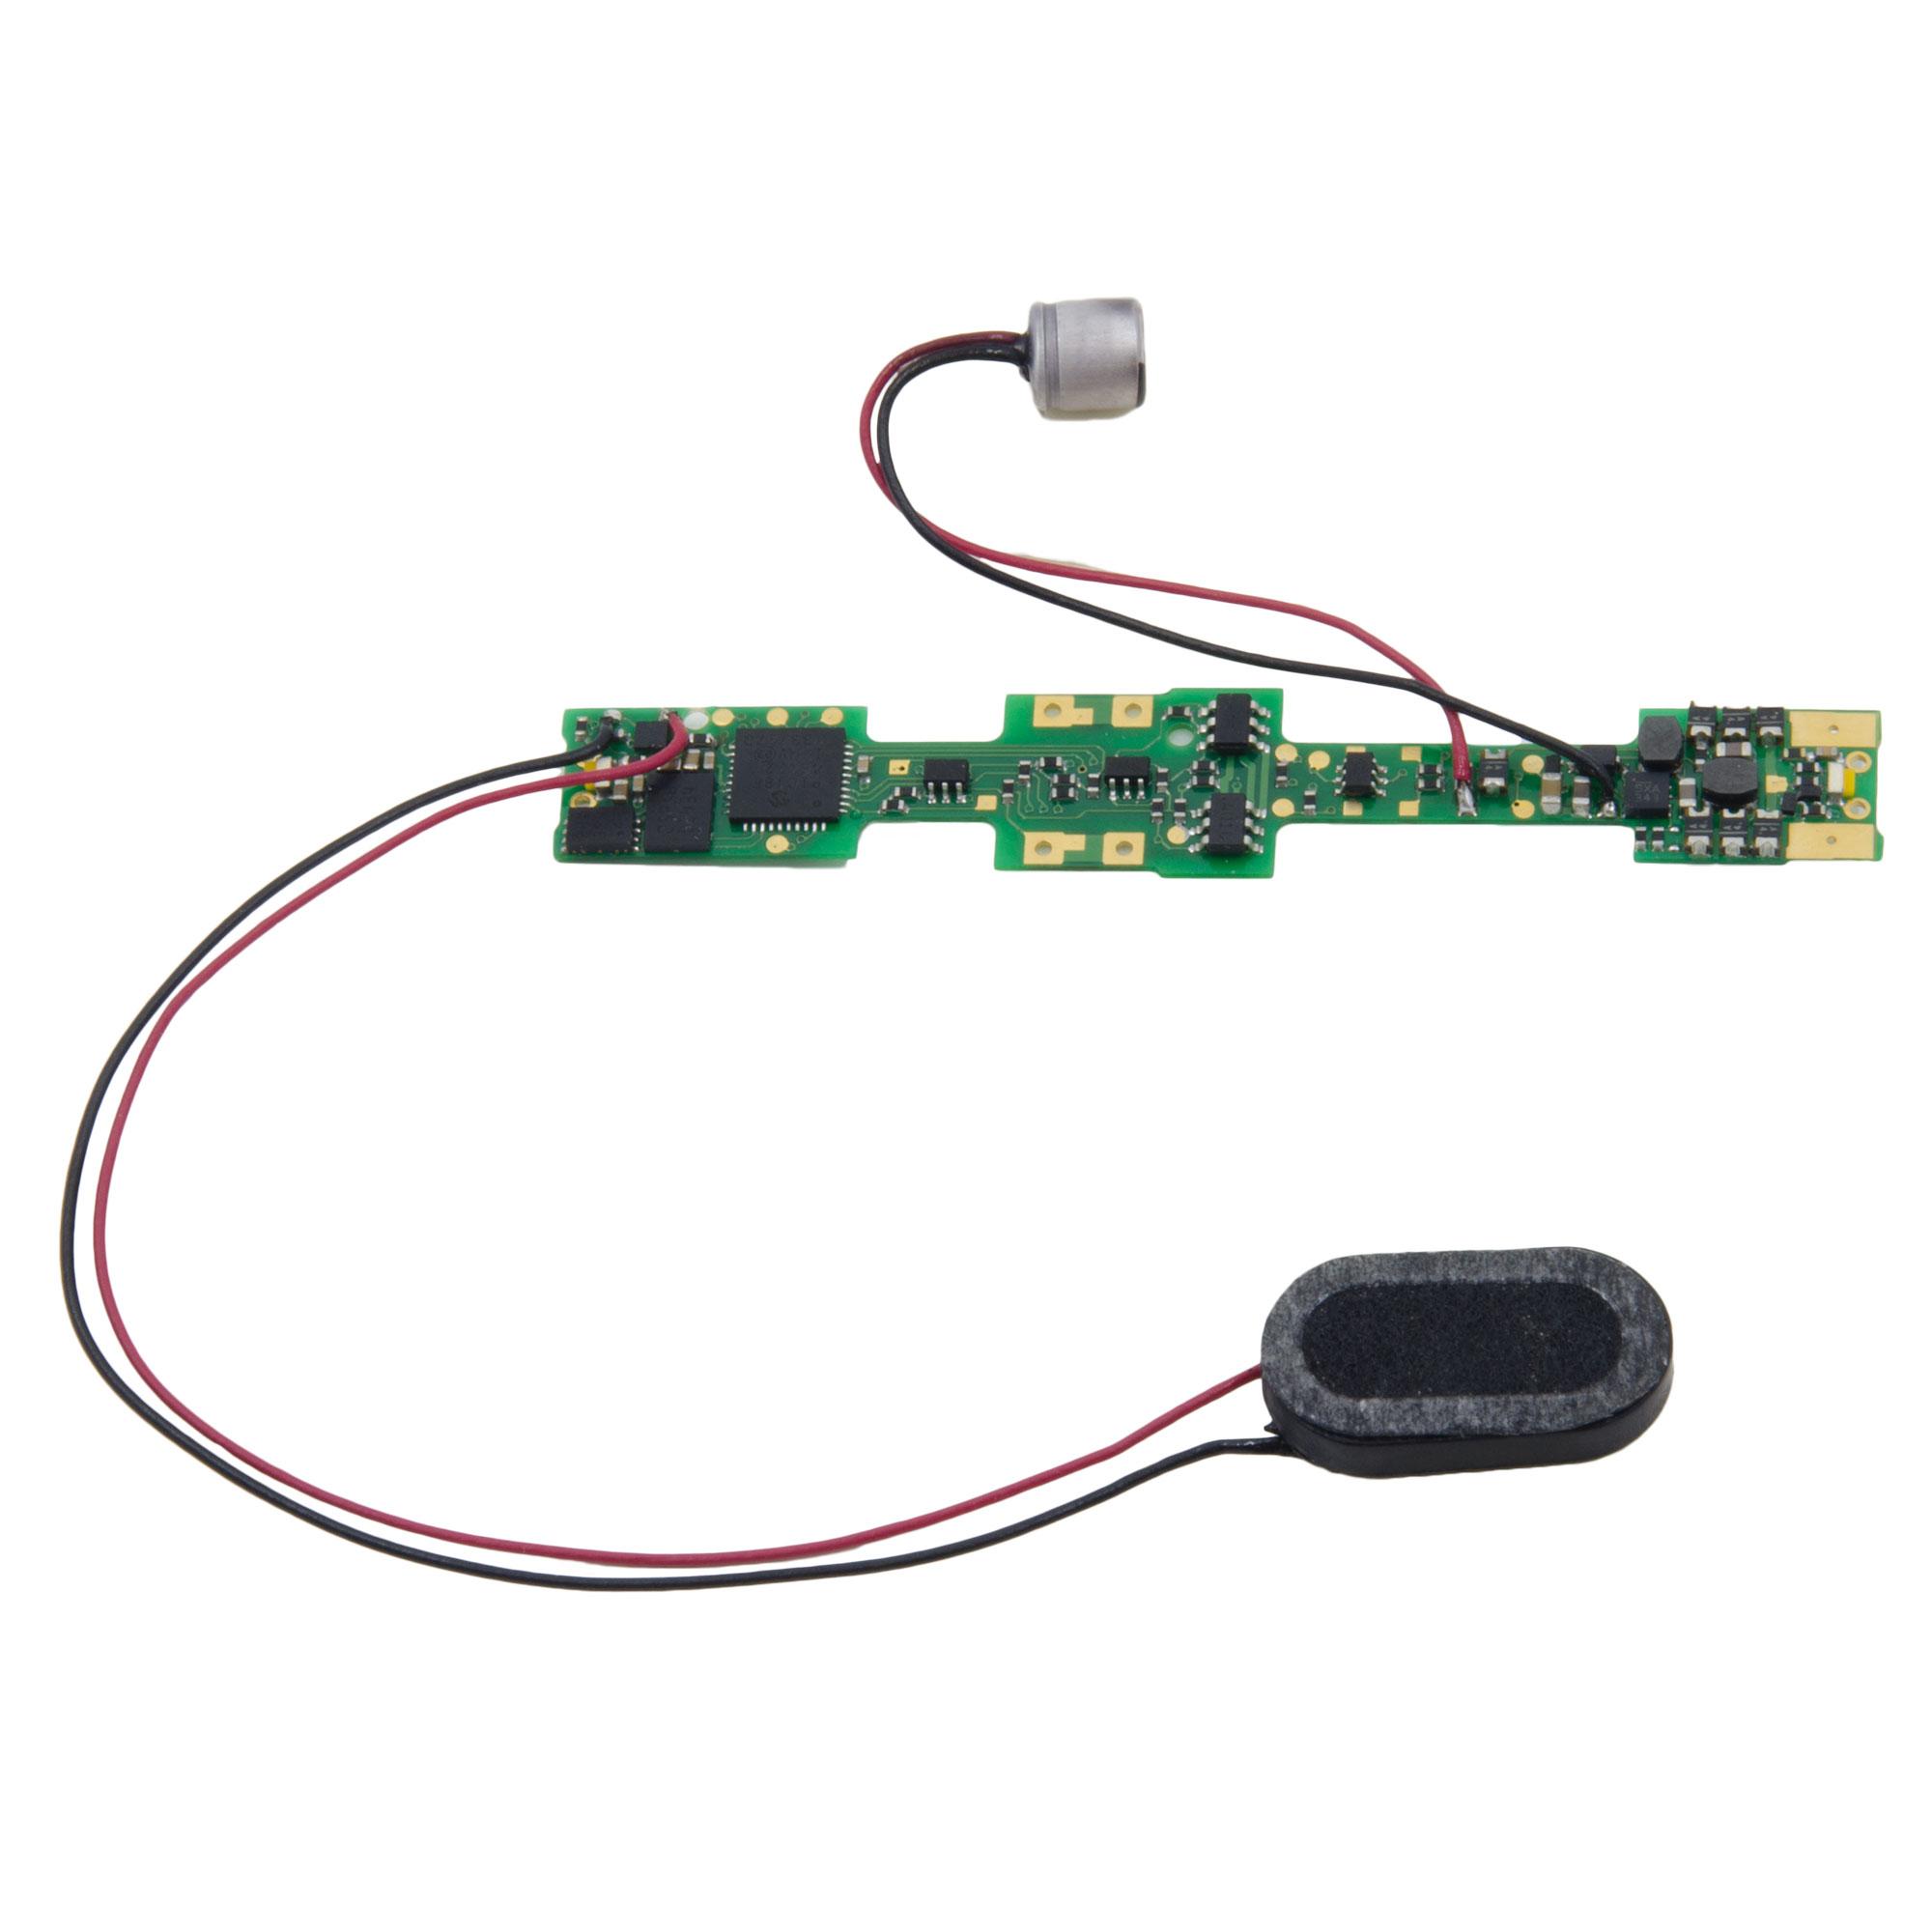 kato control wiring schematics wiring diagrams u2022 rh seniorlivinguniversity co